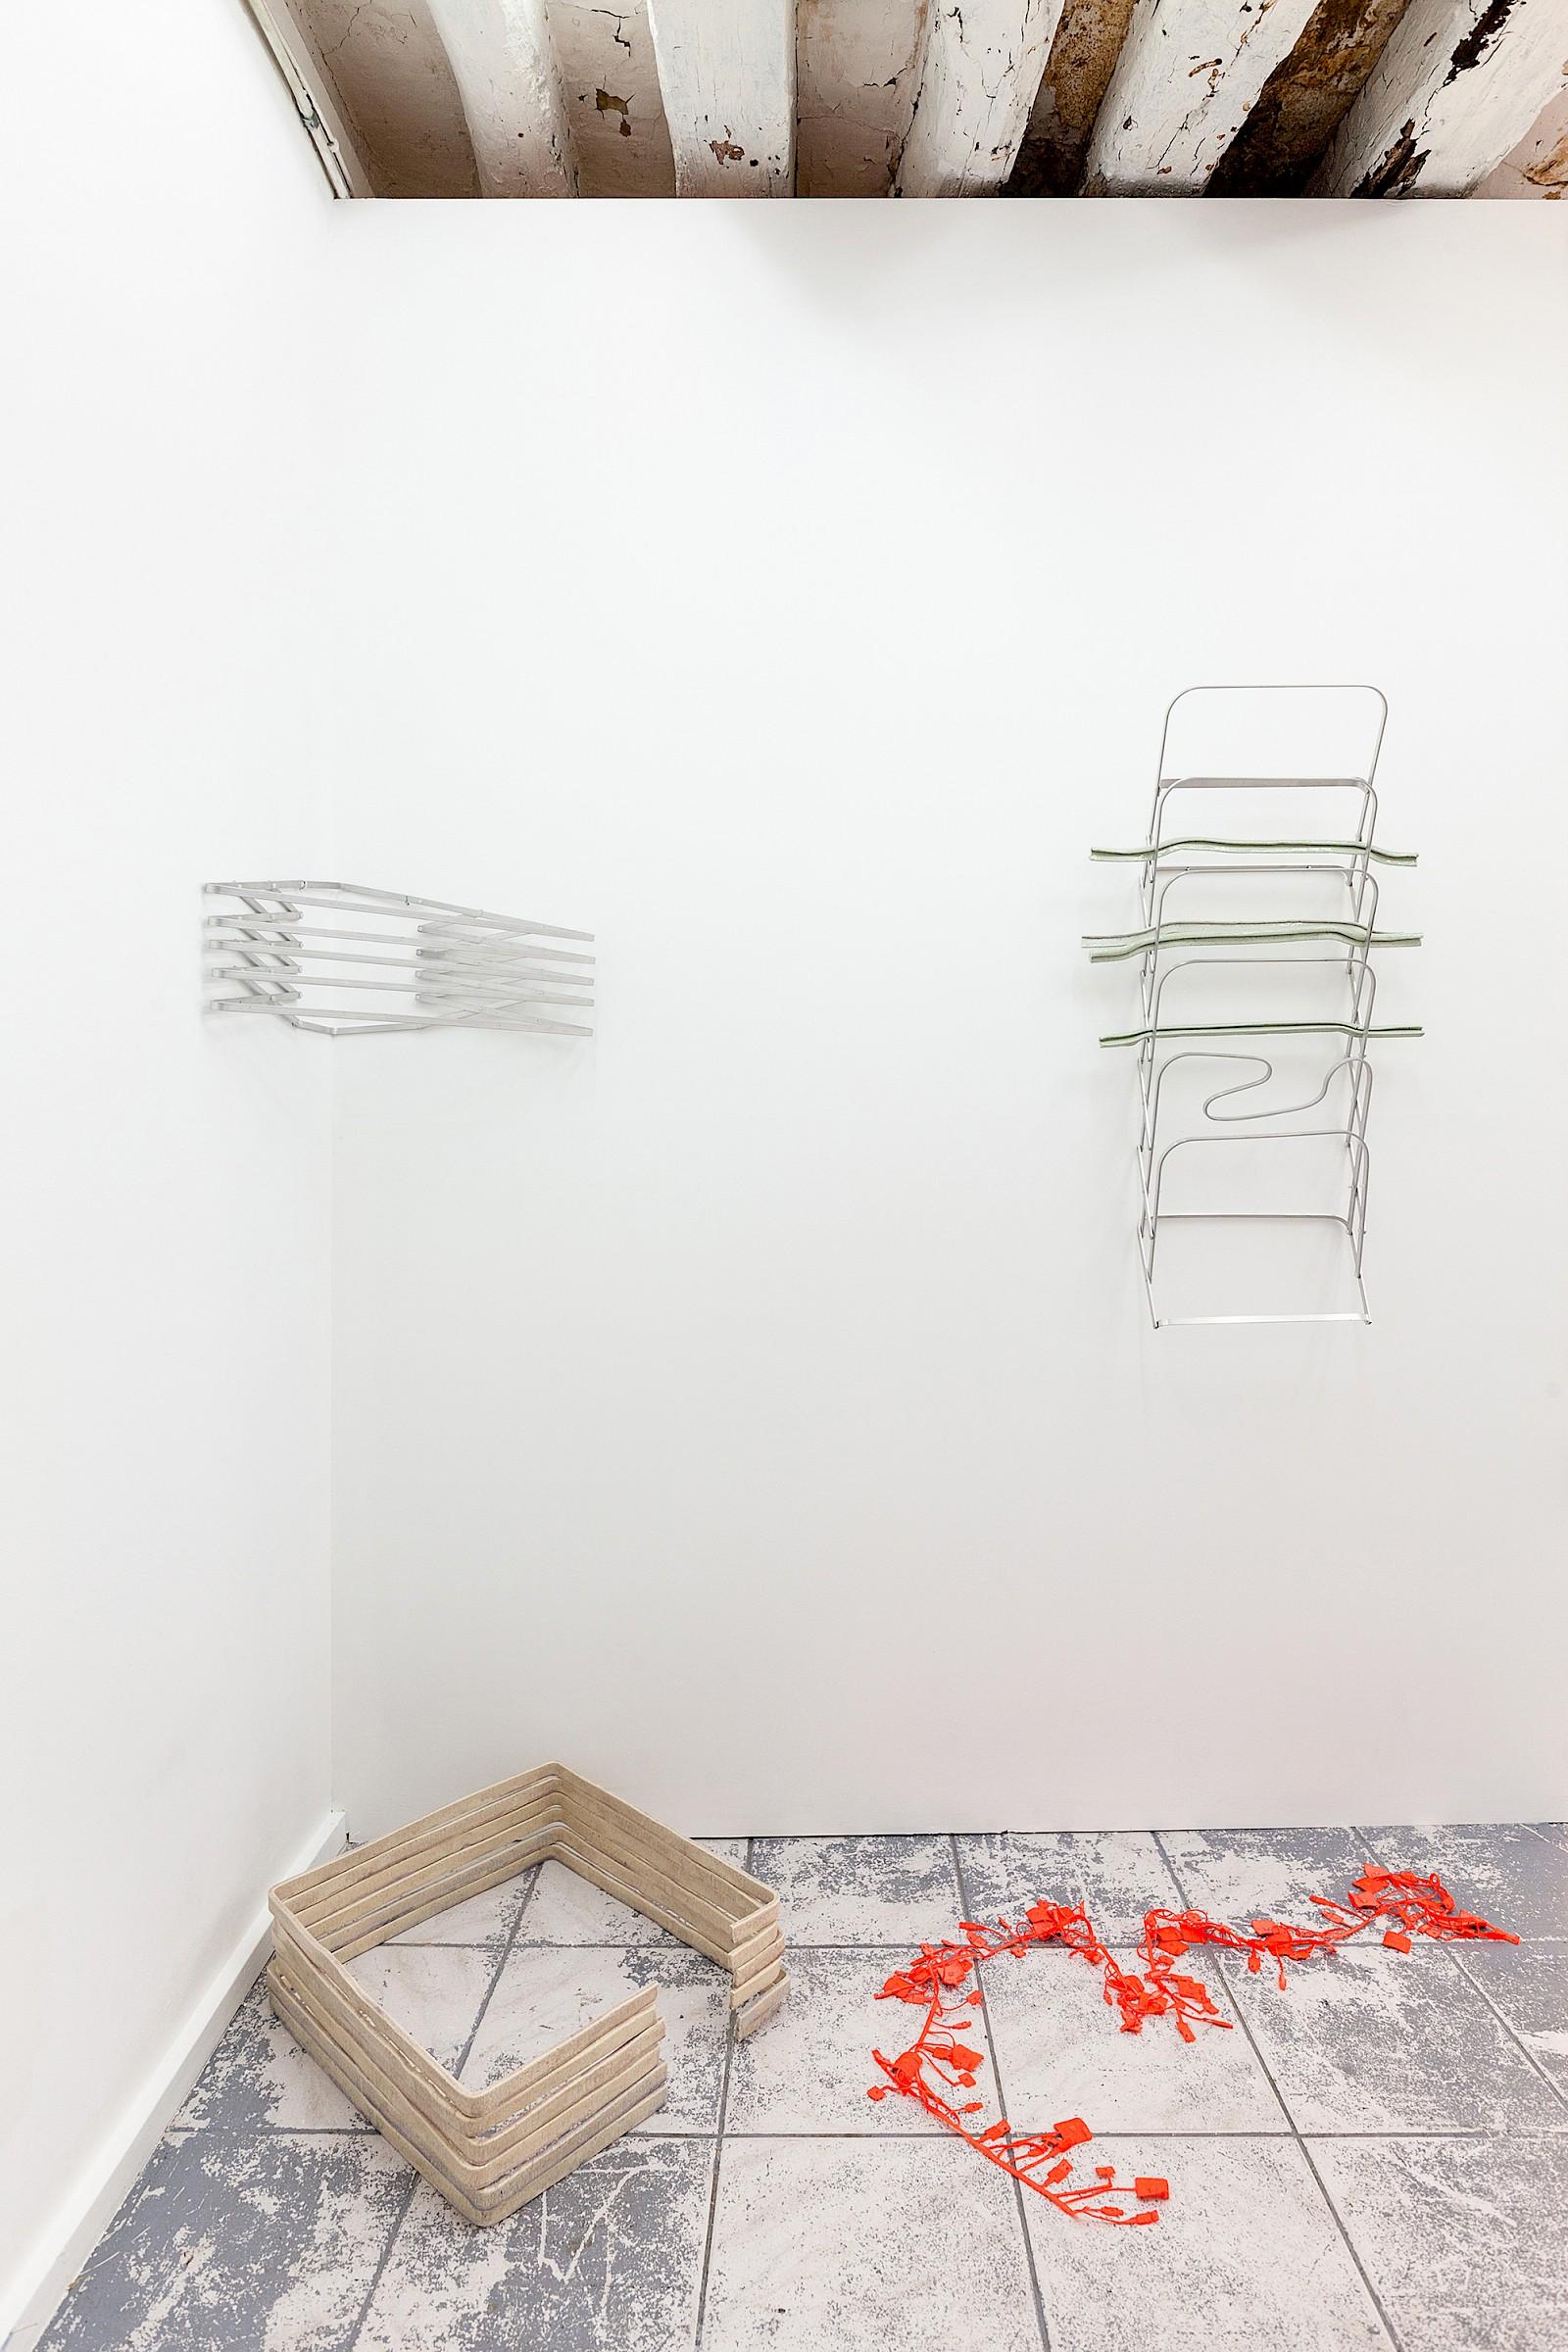 Image - Installation view